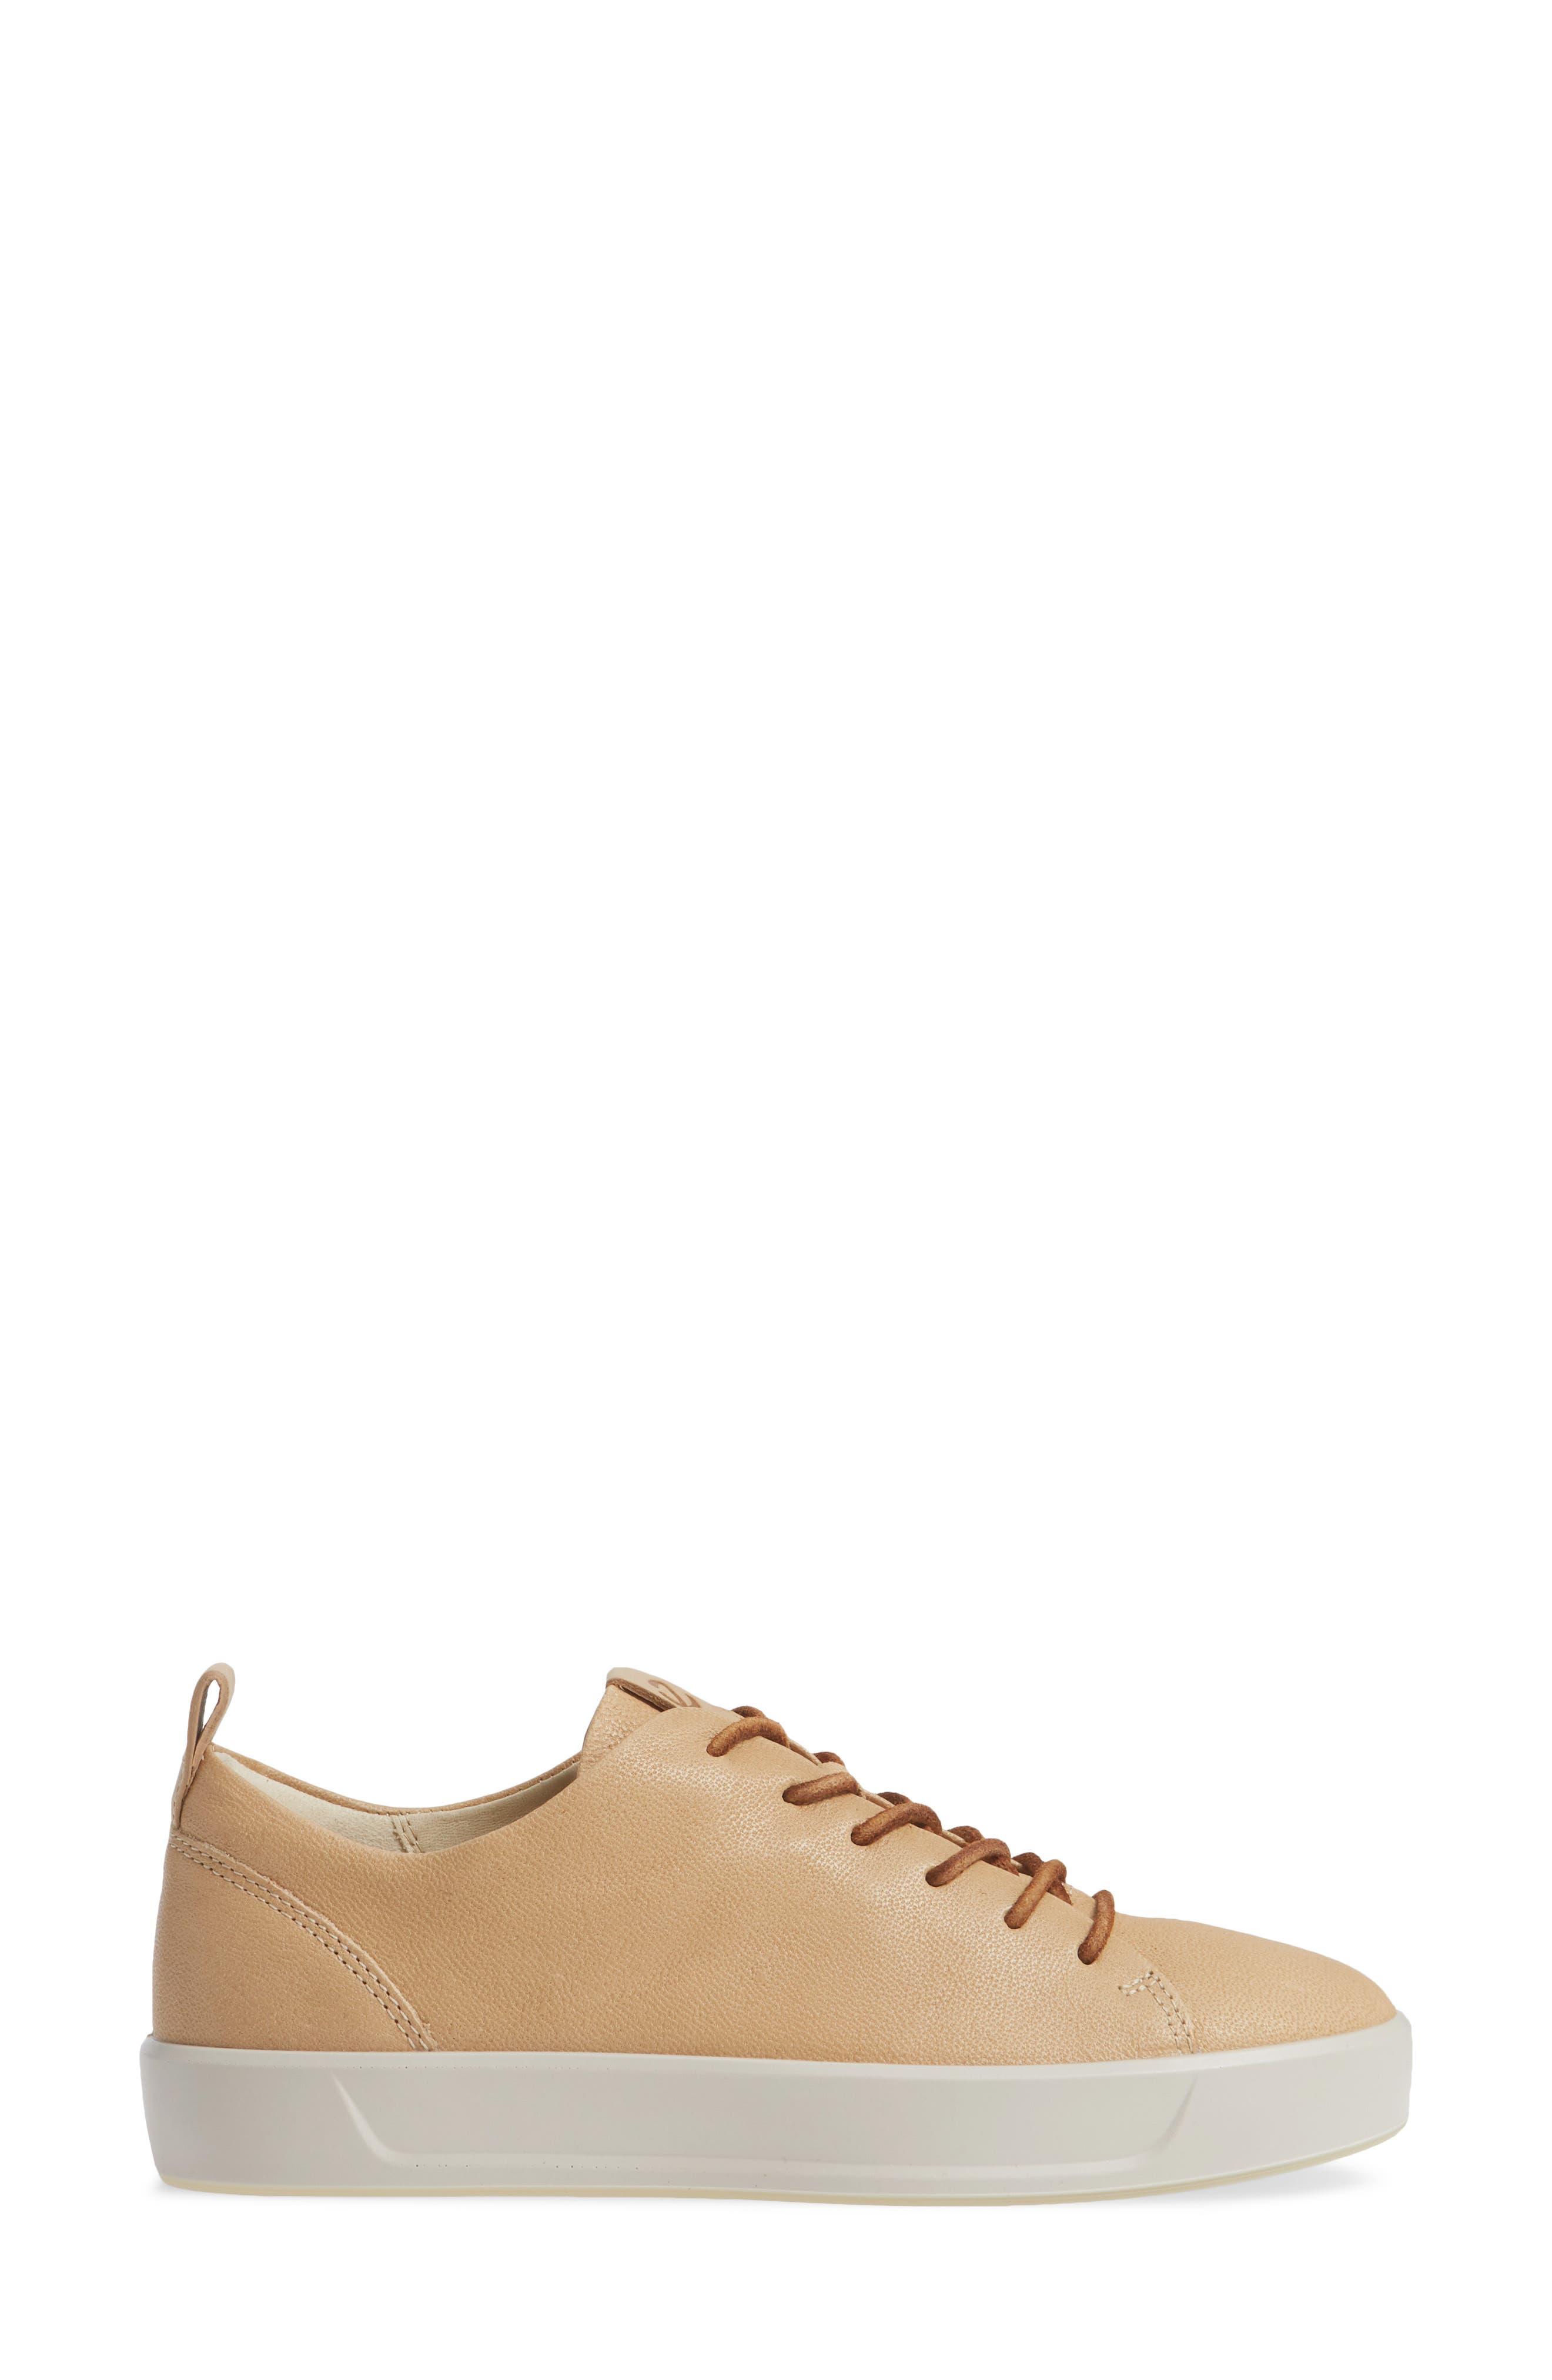 ECCO, Soft 8 Sneaker, Alternate thumbnail 3, color, POWDER LEATHER